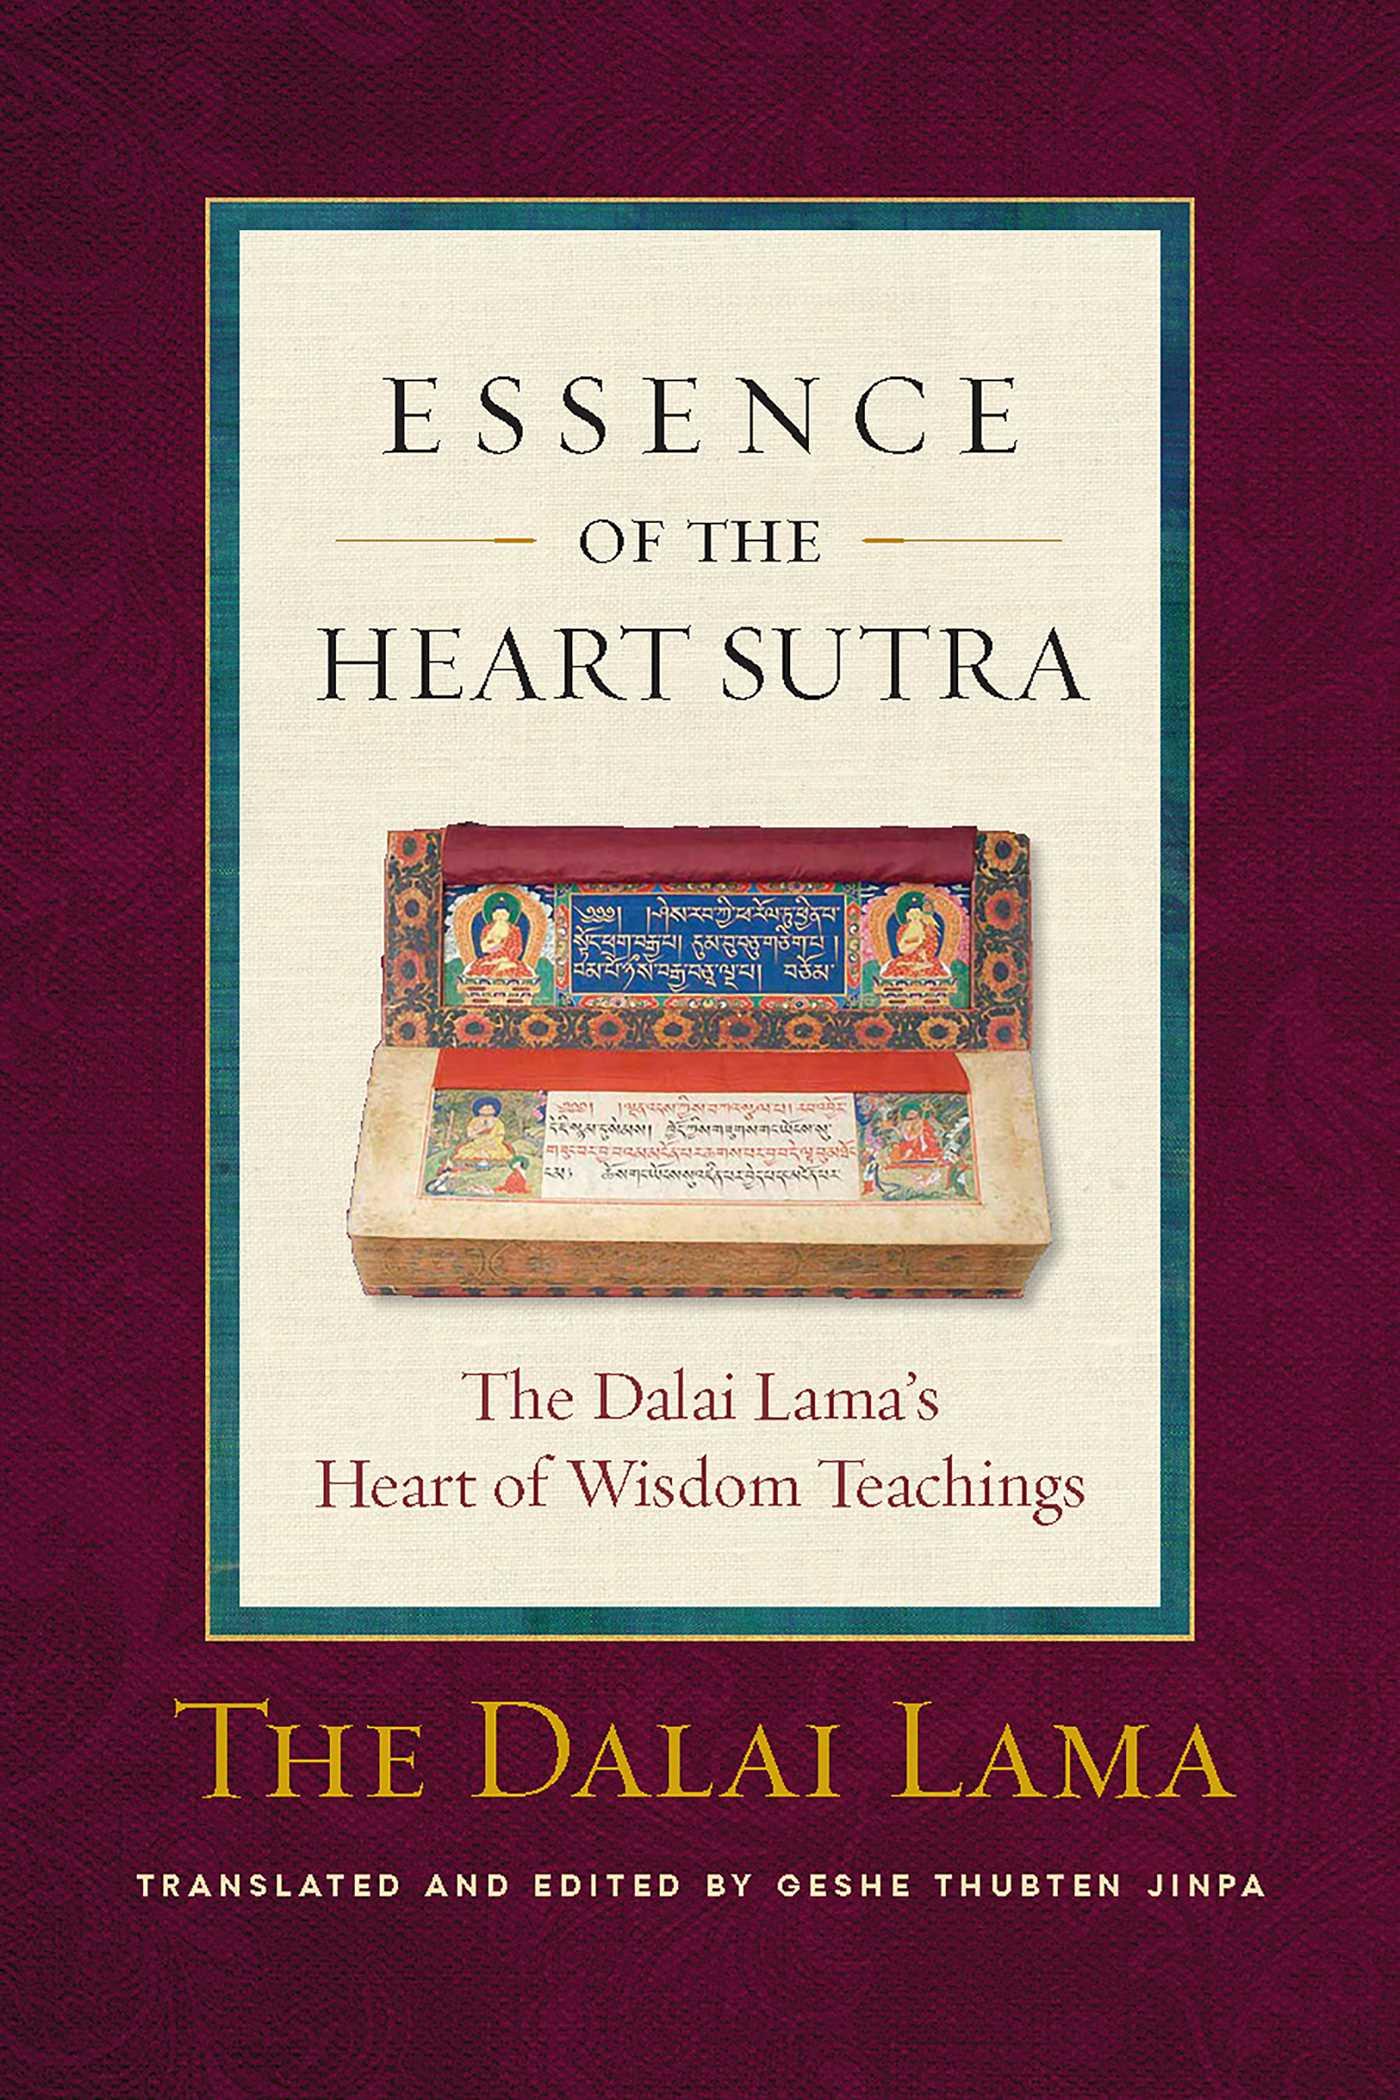 Essence Of The Heart Sutra Ebook By Thupten Jinpa Dalai border=